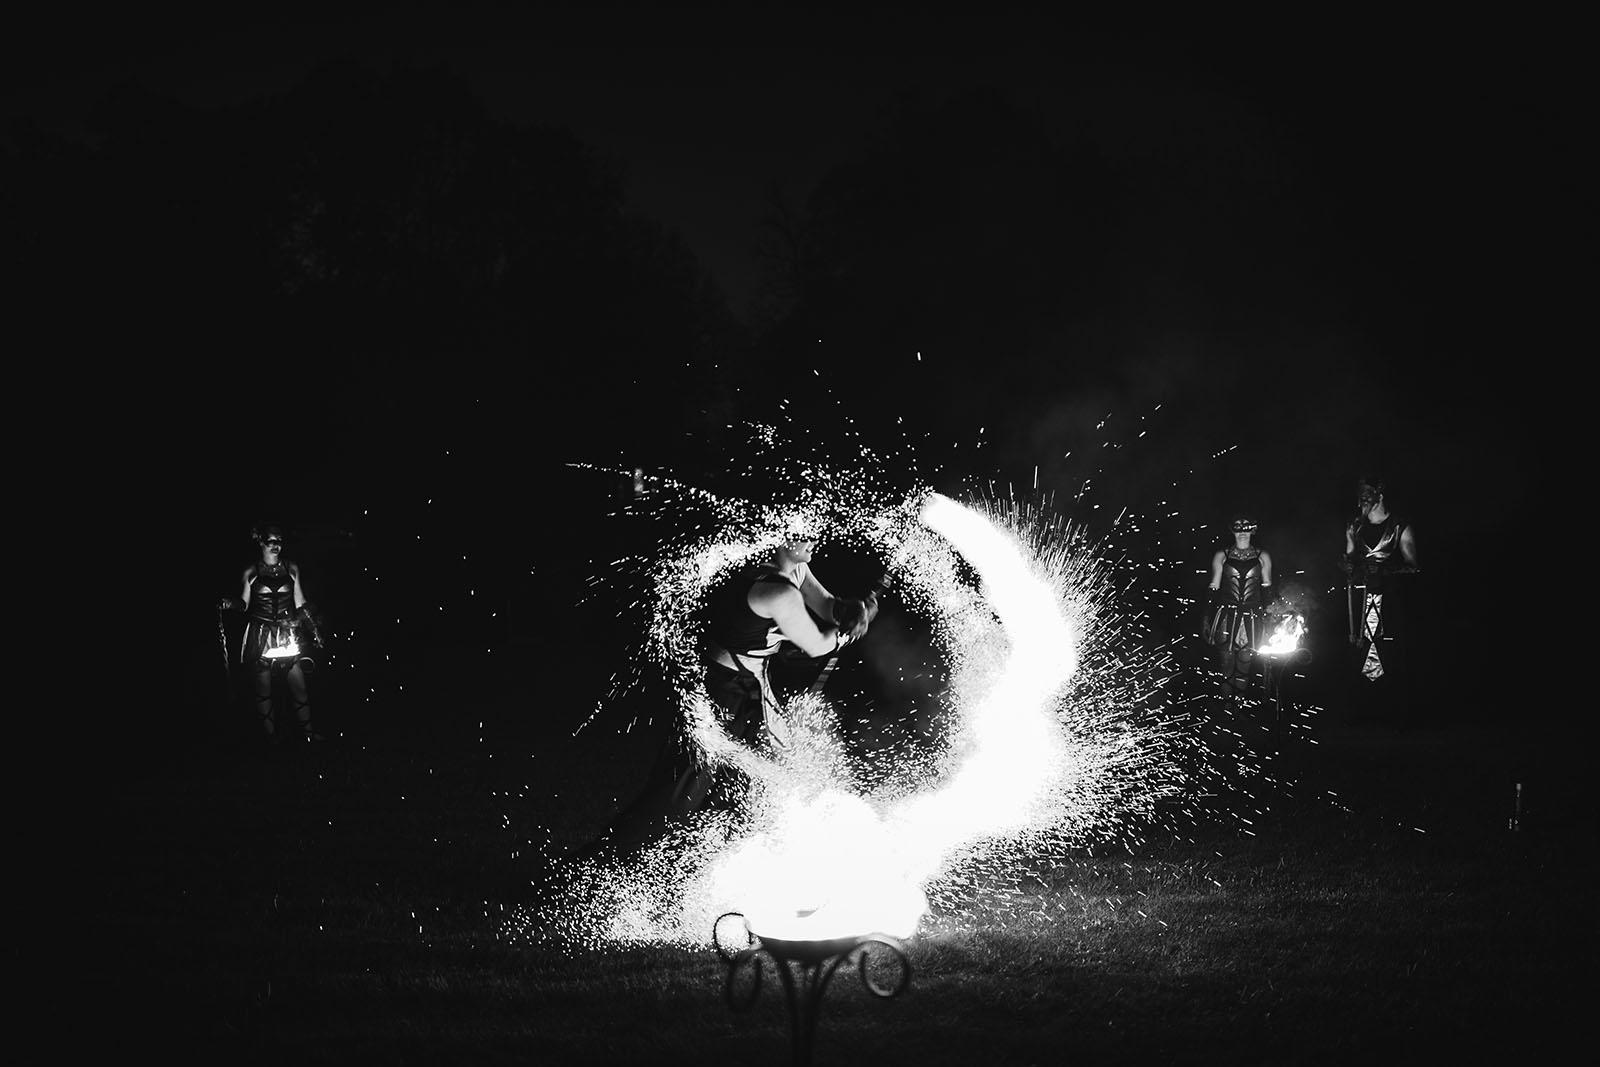 untitled-16.05.2019-Fotografs-Juris-Zigelis-336